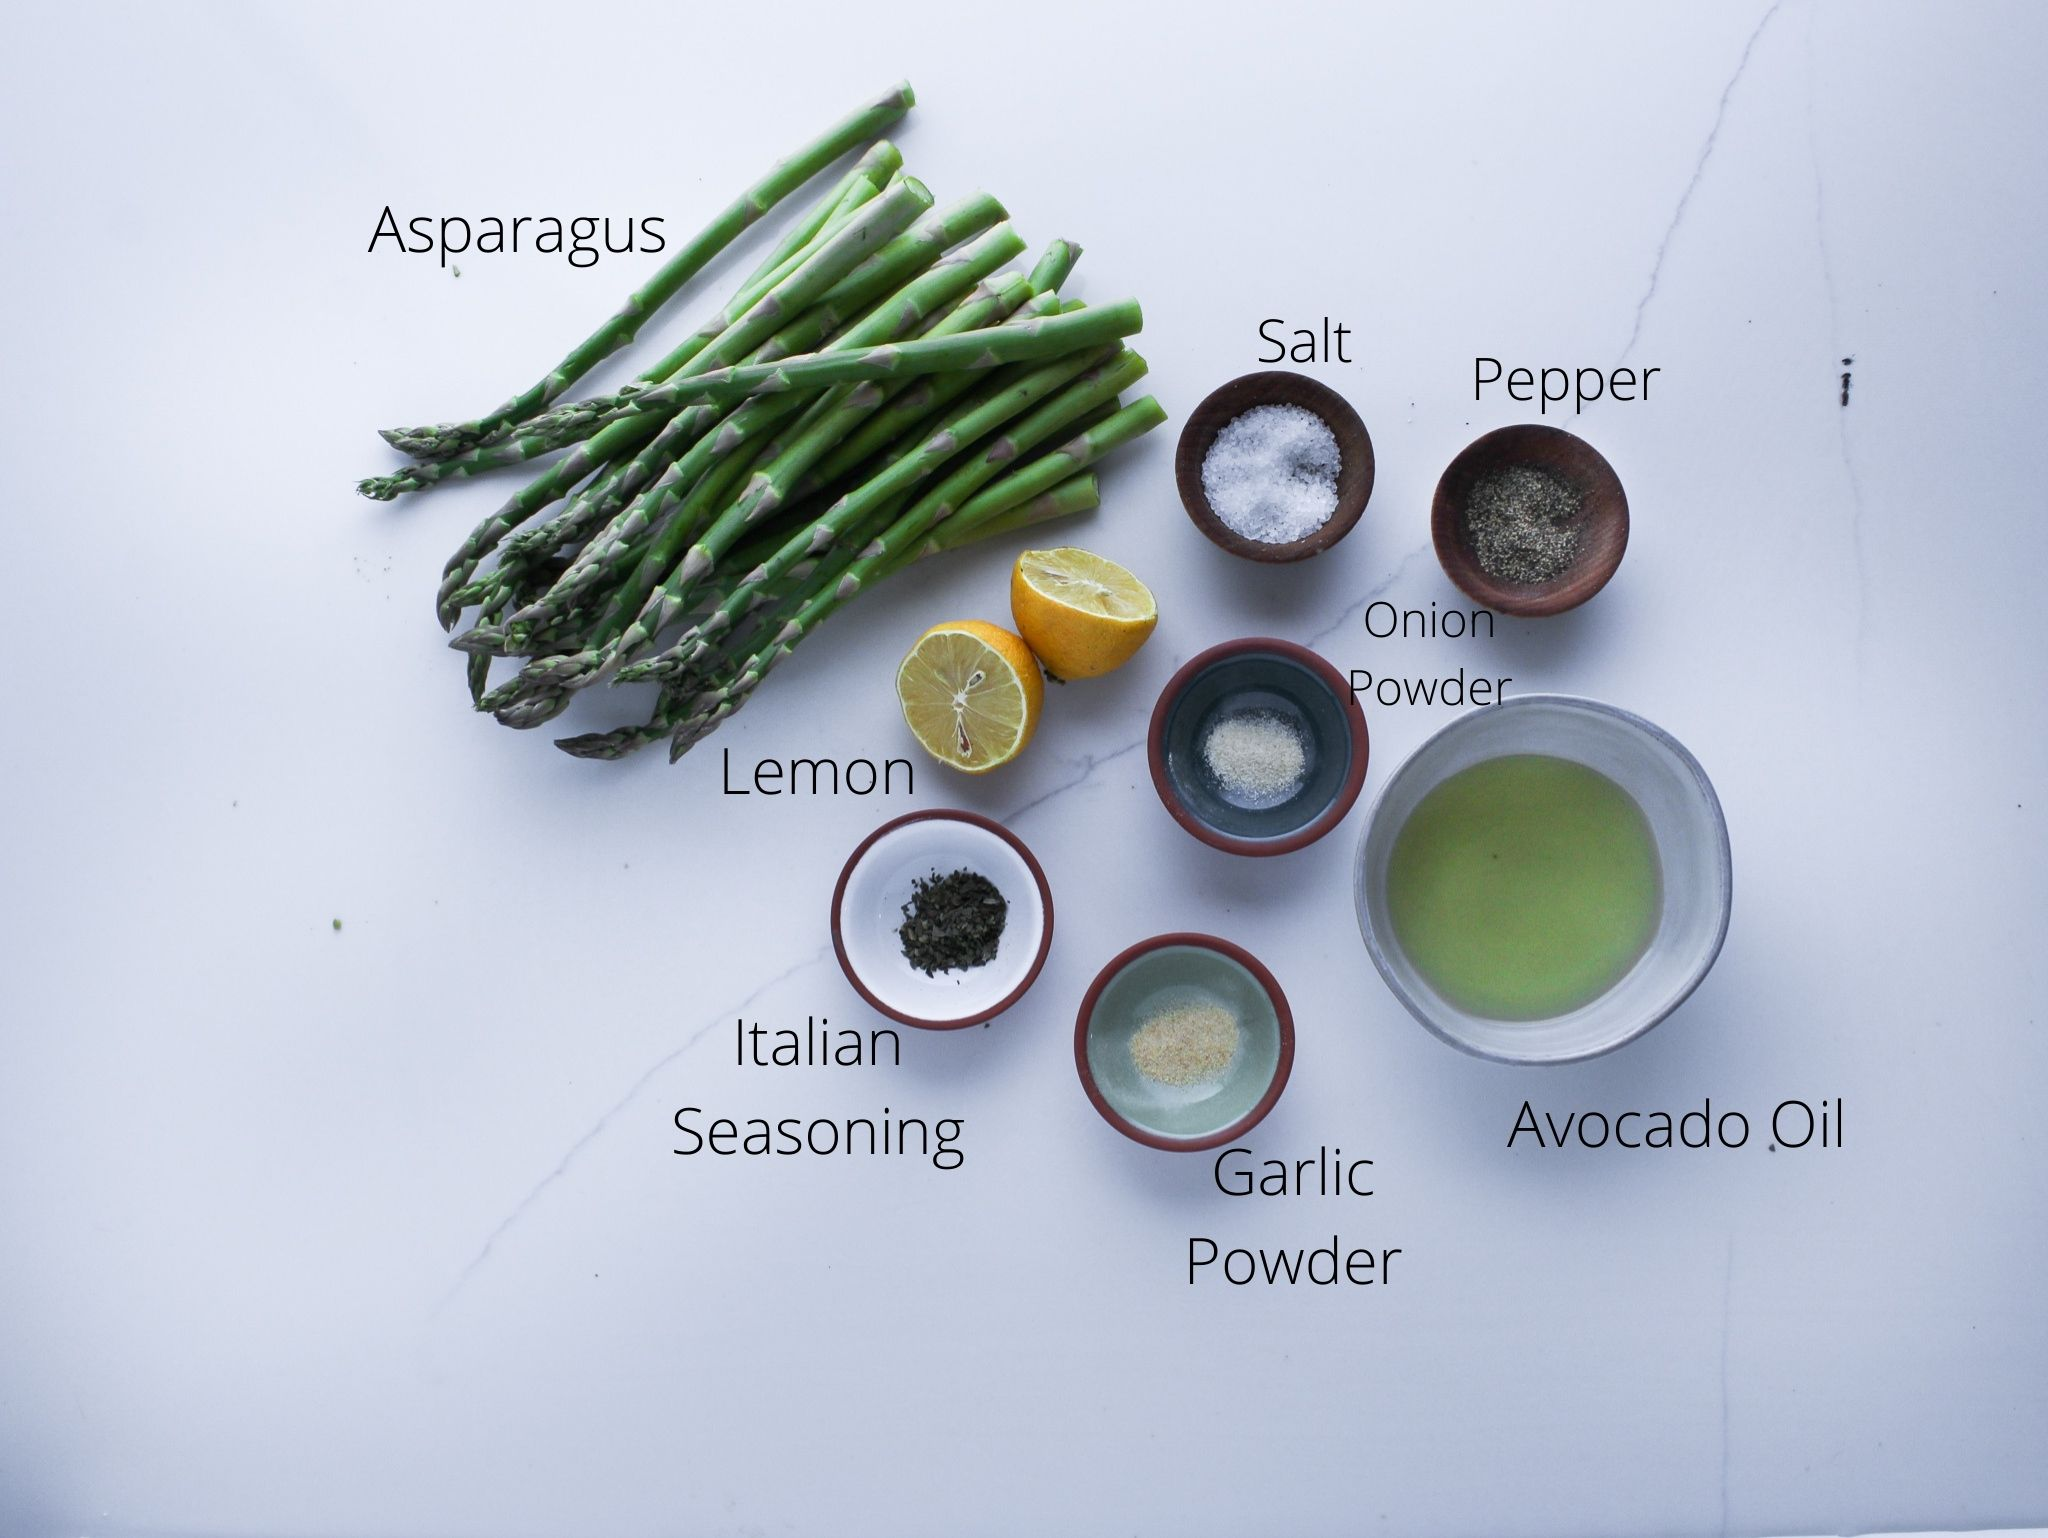 Grilled lemon and herb asparagus ingredients including asparagus, lemon, avocado oil, onion powder, garlic powder, italian seasoning, salt and pepper.